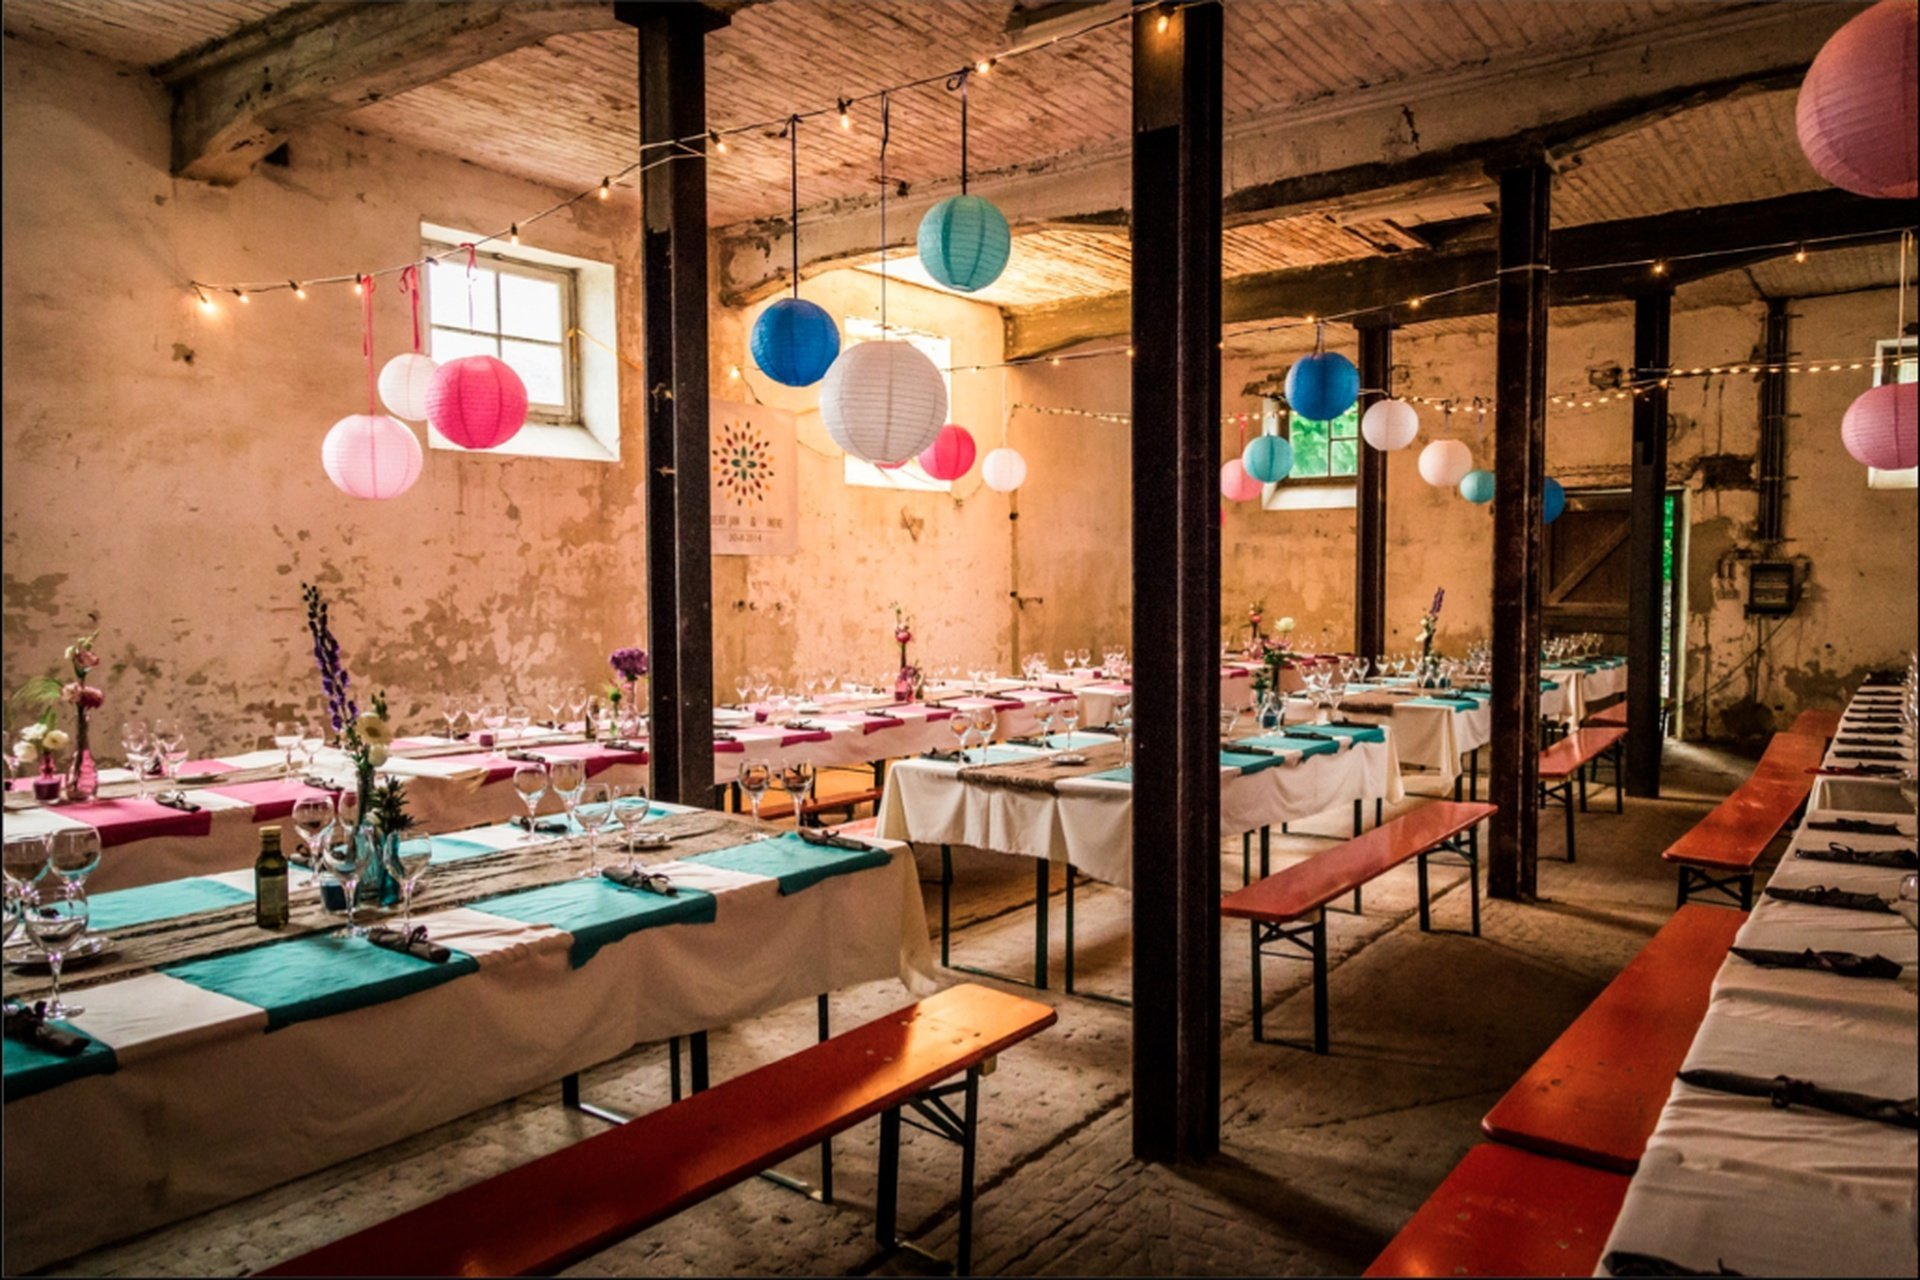 Amsterdam workshop spaces Coworking space Domaine des Officiers image 0